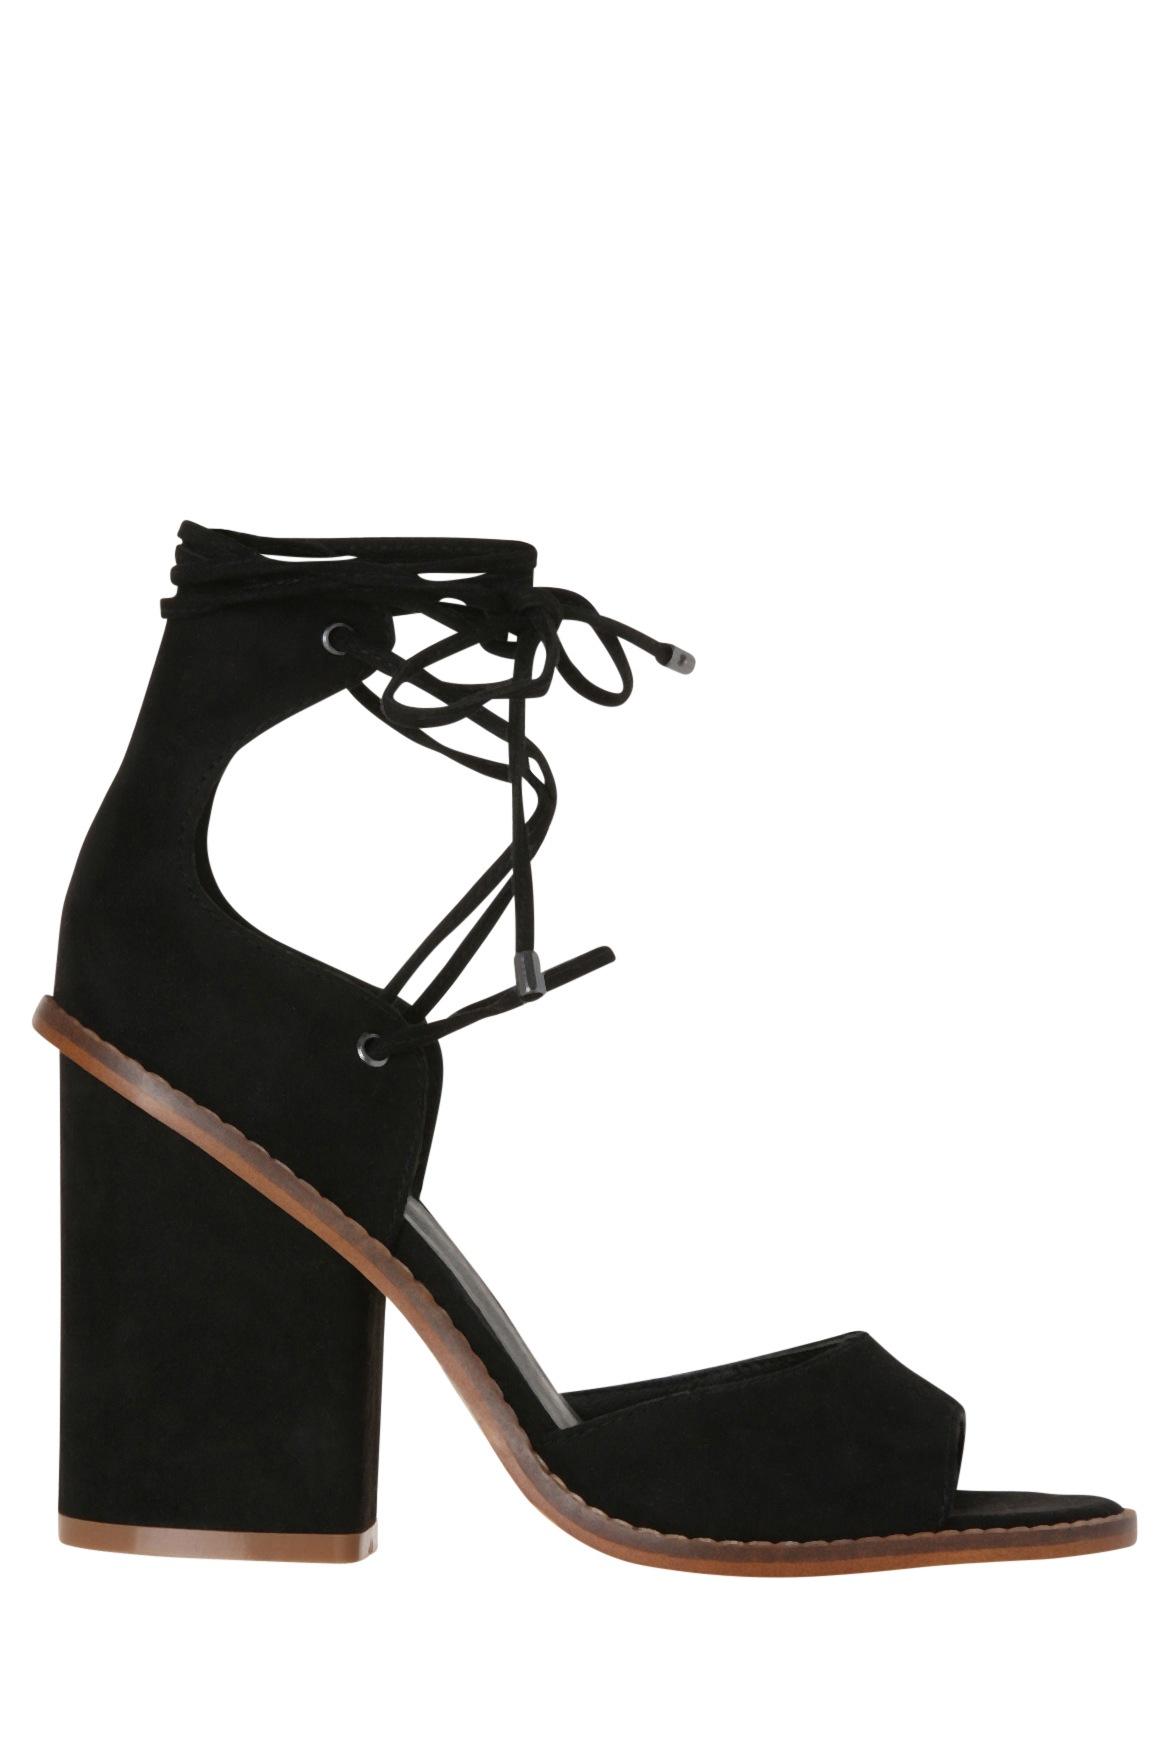 Black sandals myer - Black Sandals Myer 43